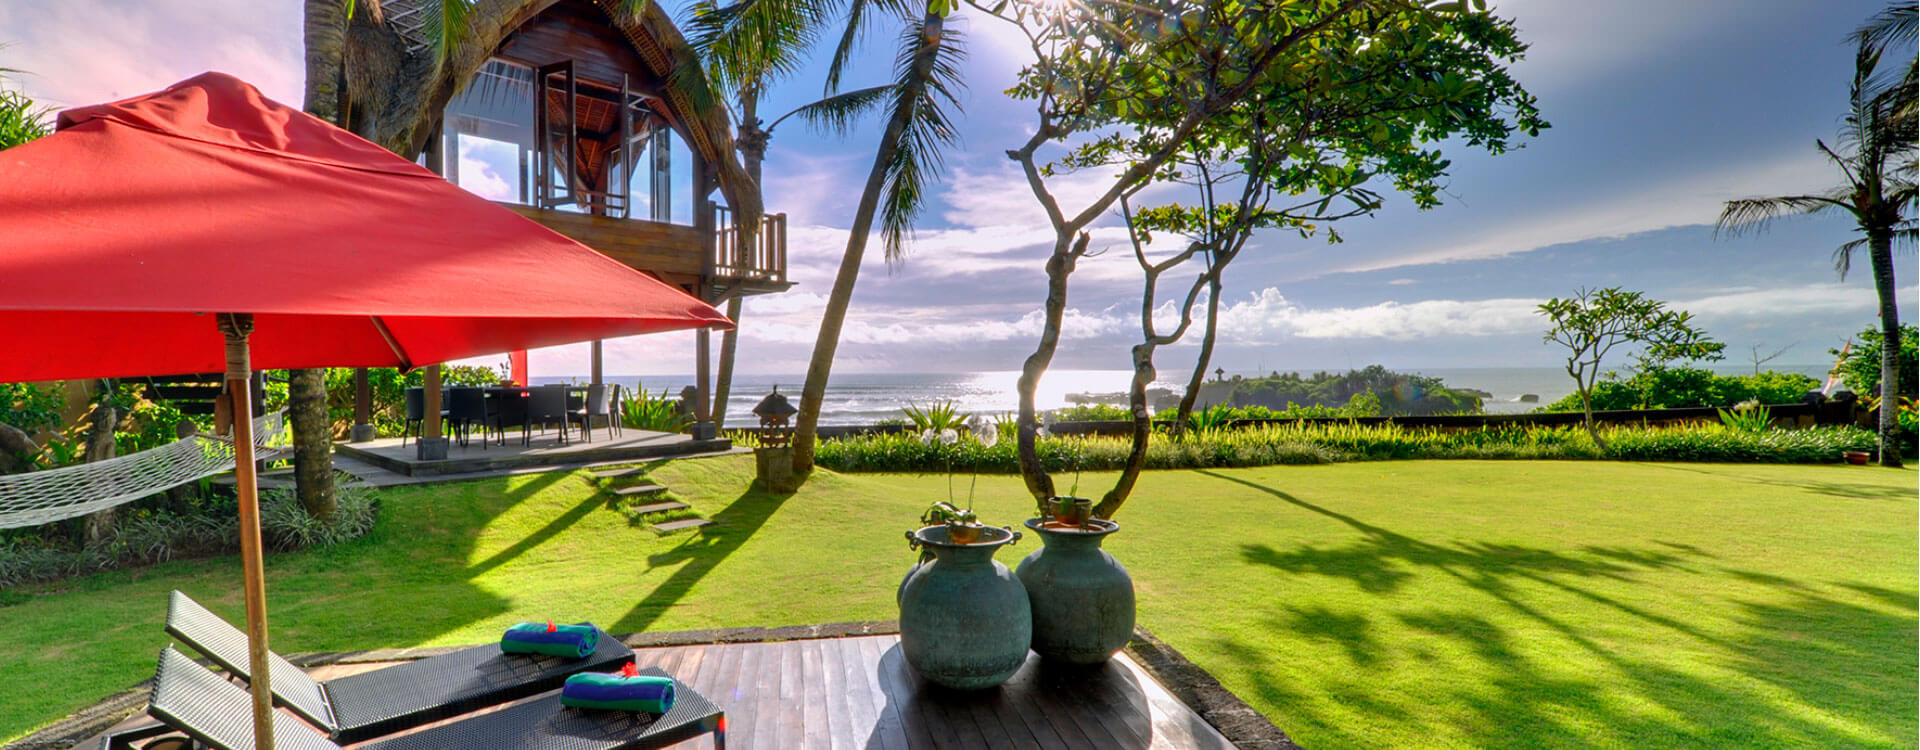 Villa Maridadi - Garden Loungers.jpg